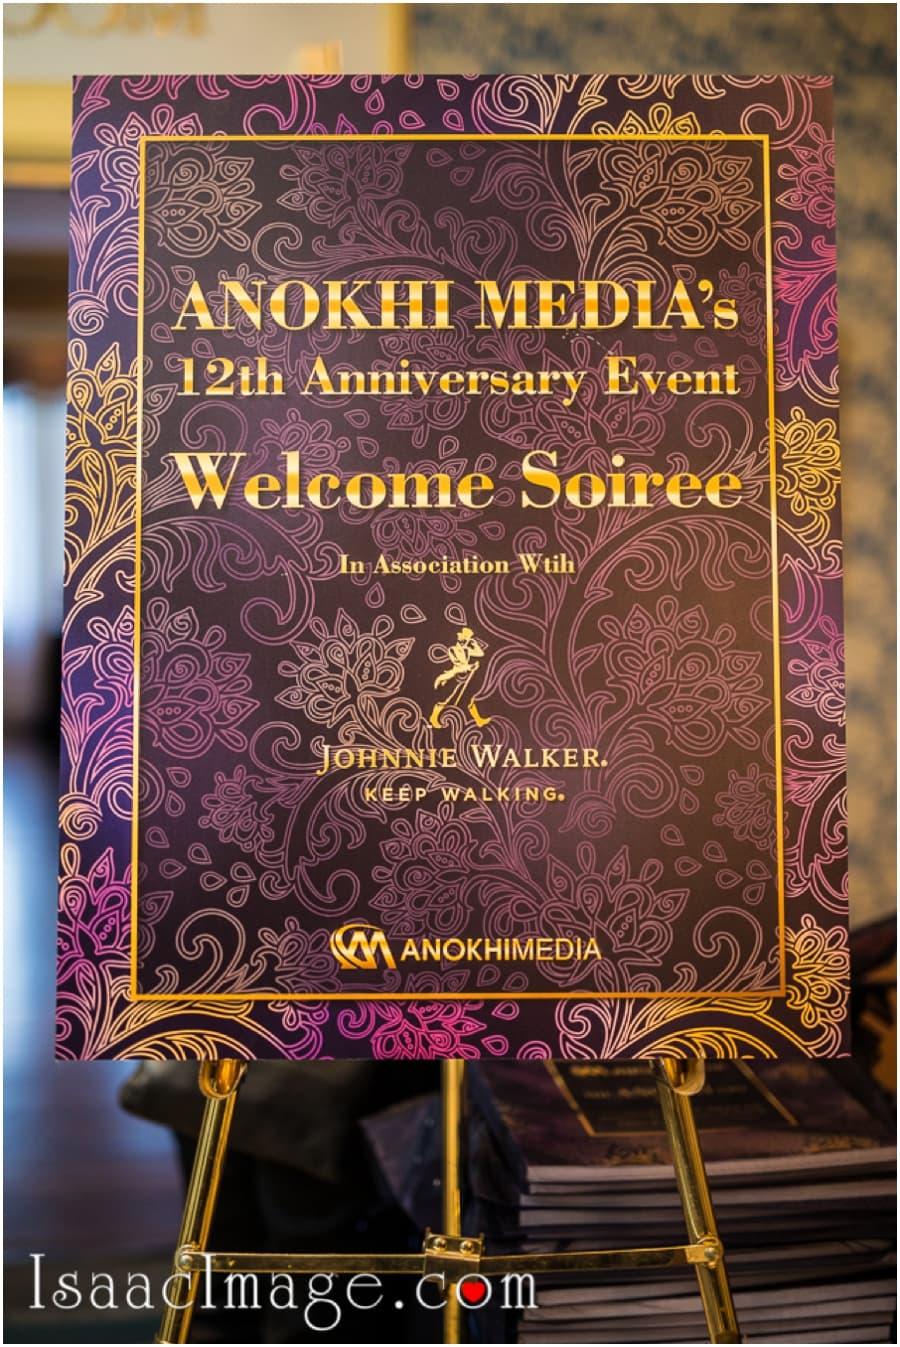 Anokhi media's 12th Anniversary event Welcome soiree_7570.jpg